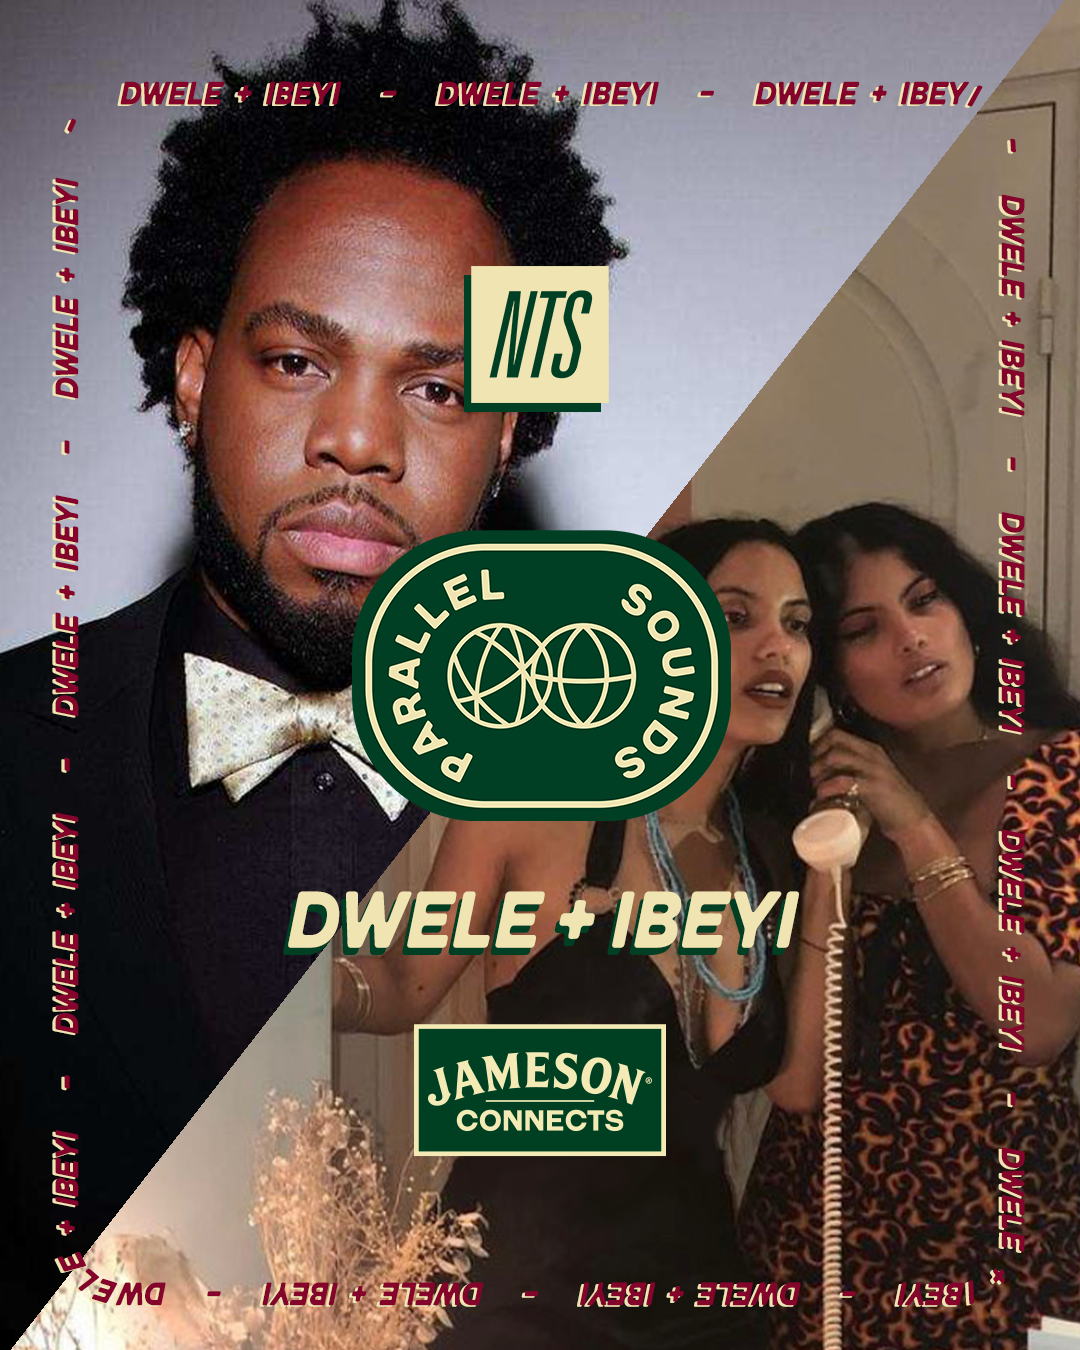 Dwele - Ibeyi 4x5_V2.png